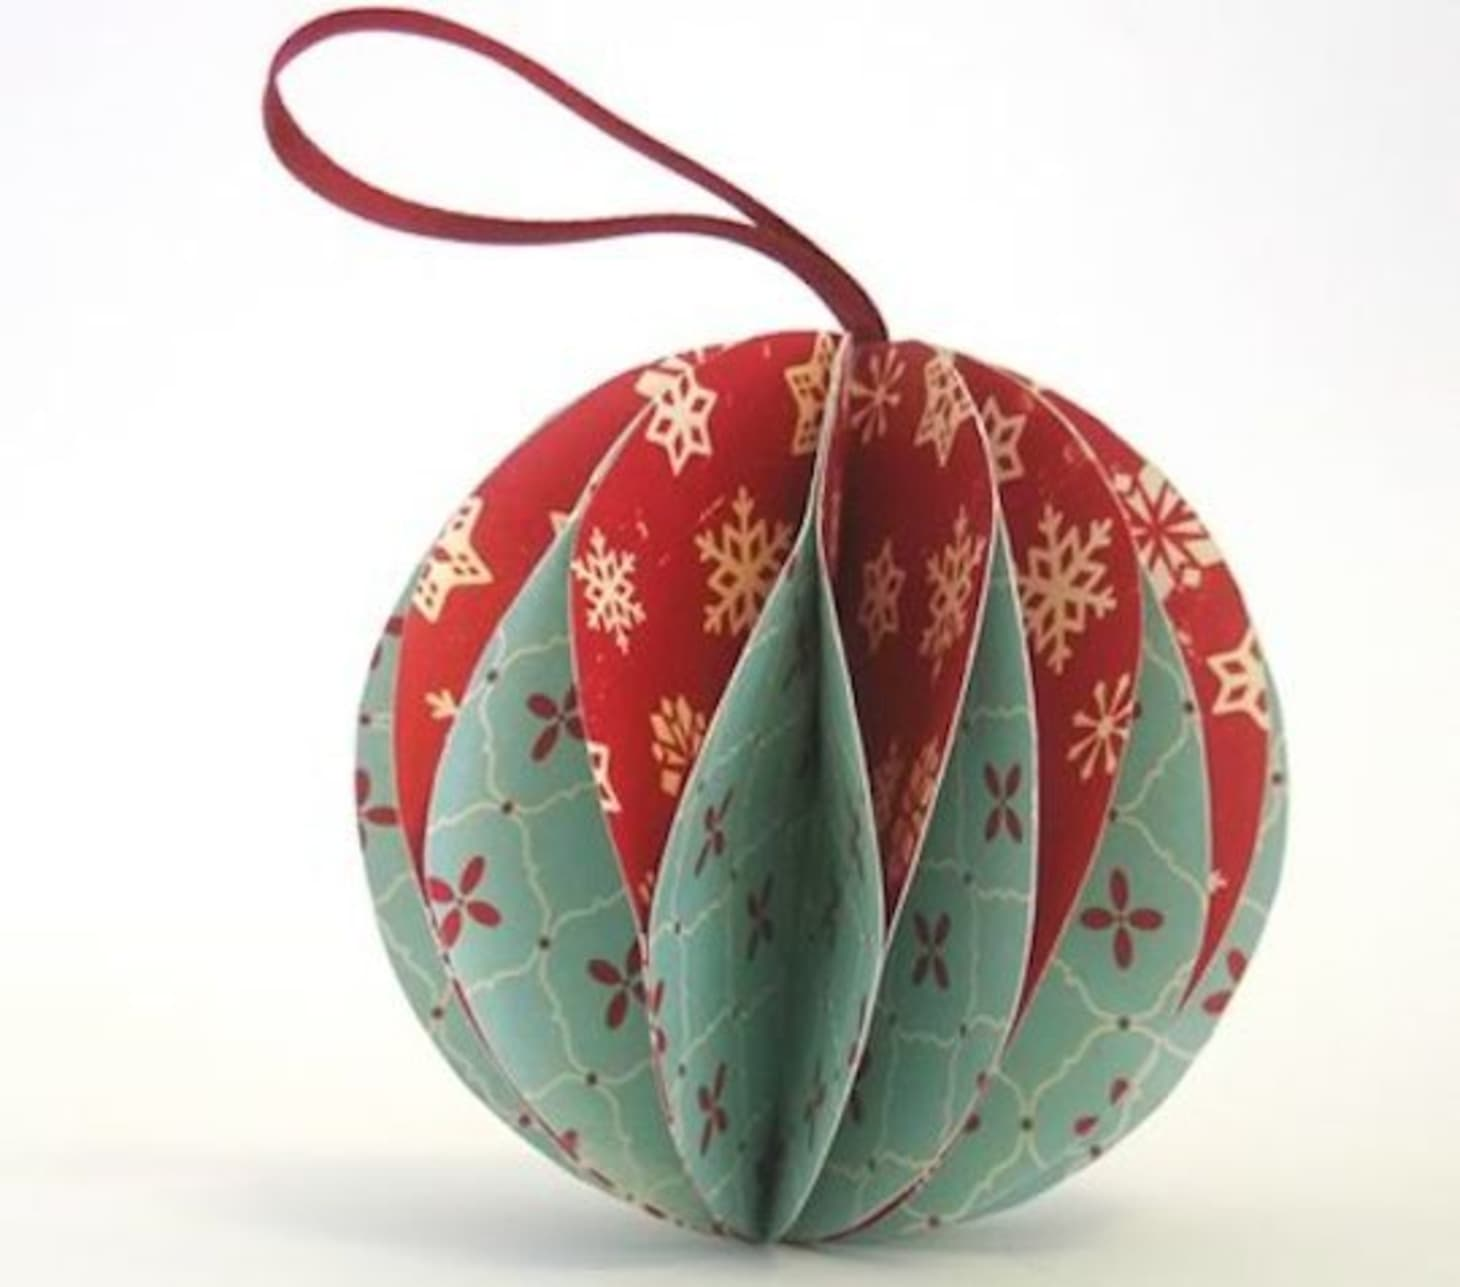 Origami Santa Ornament: Origami Christmas Ornaments